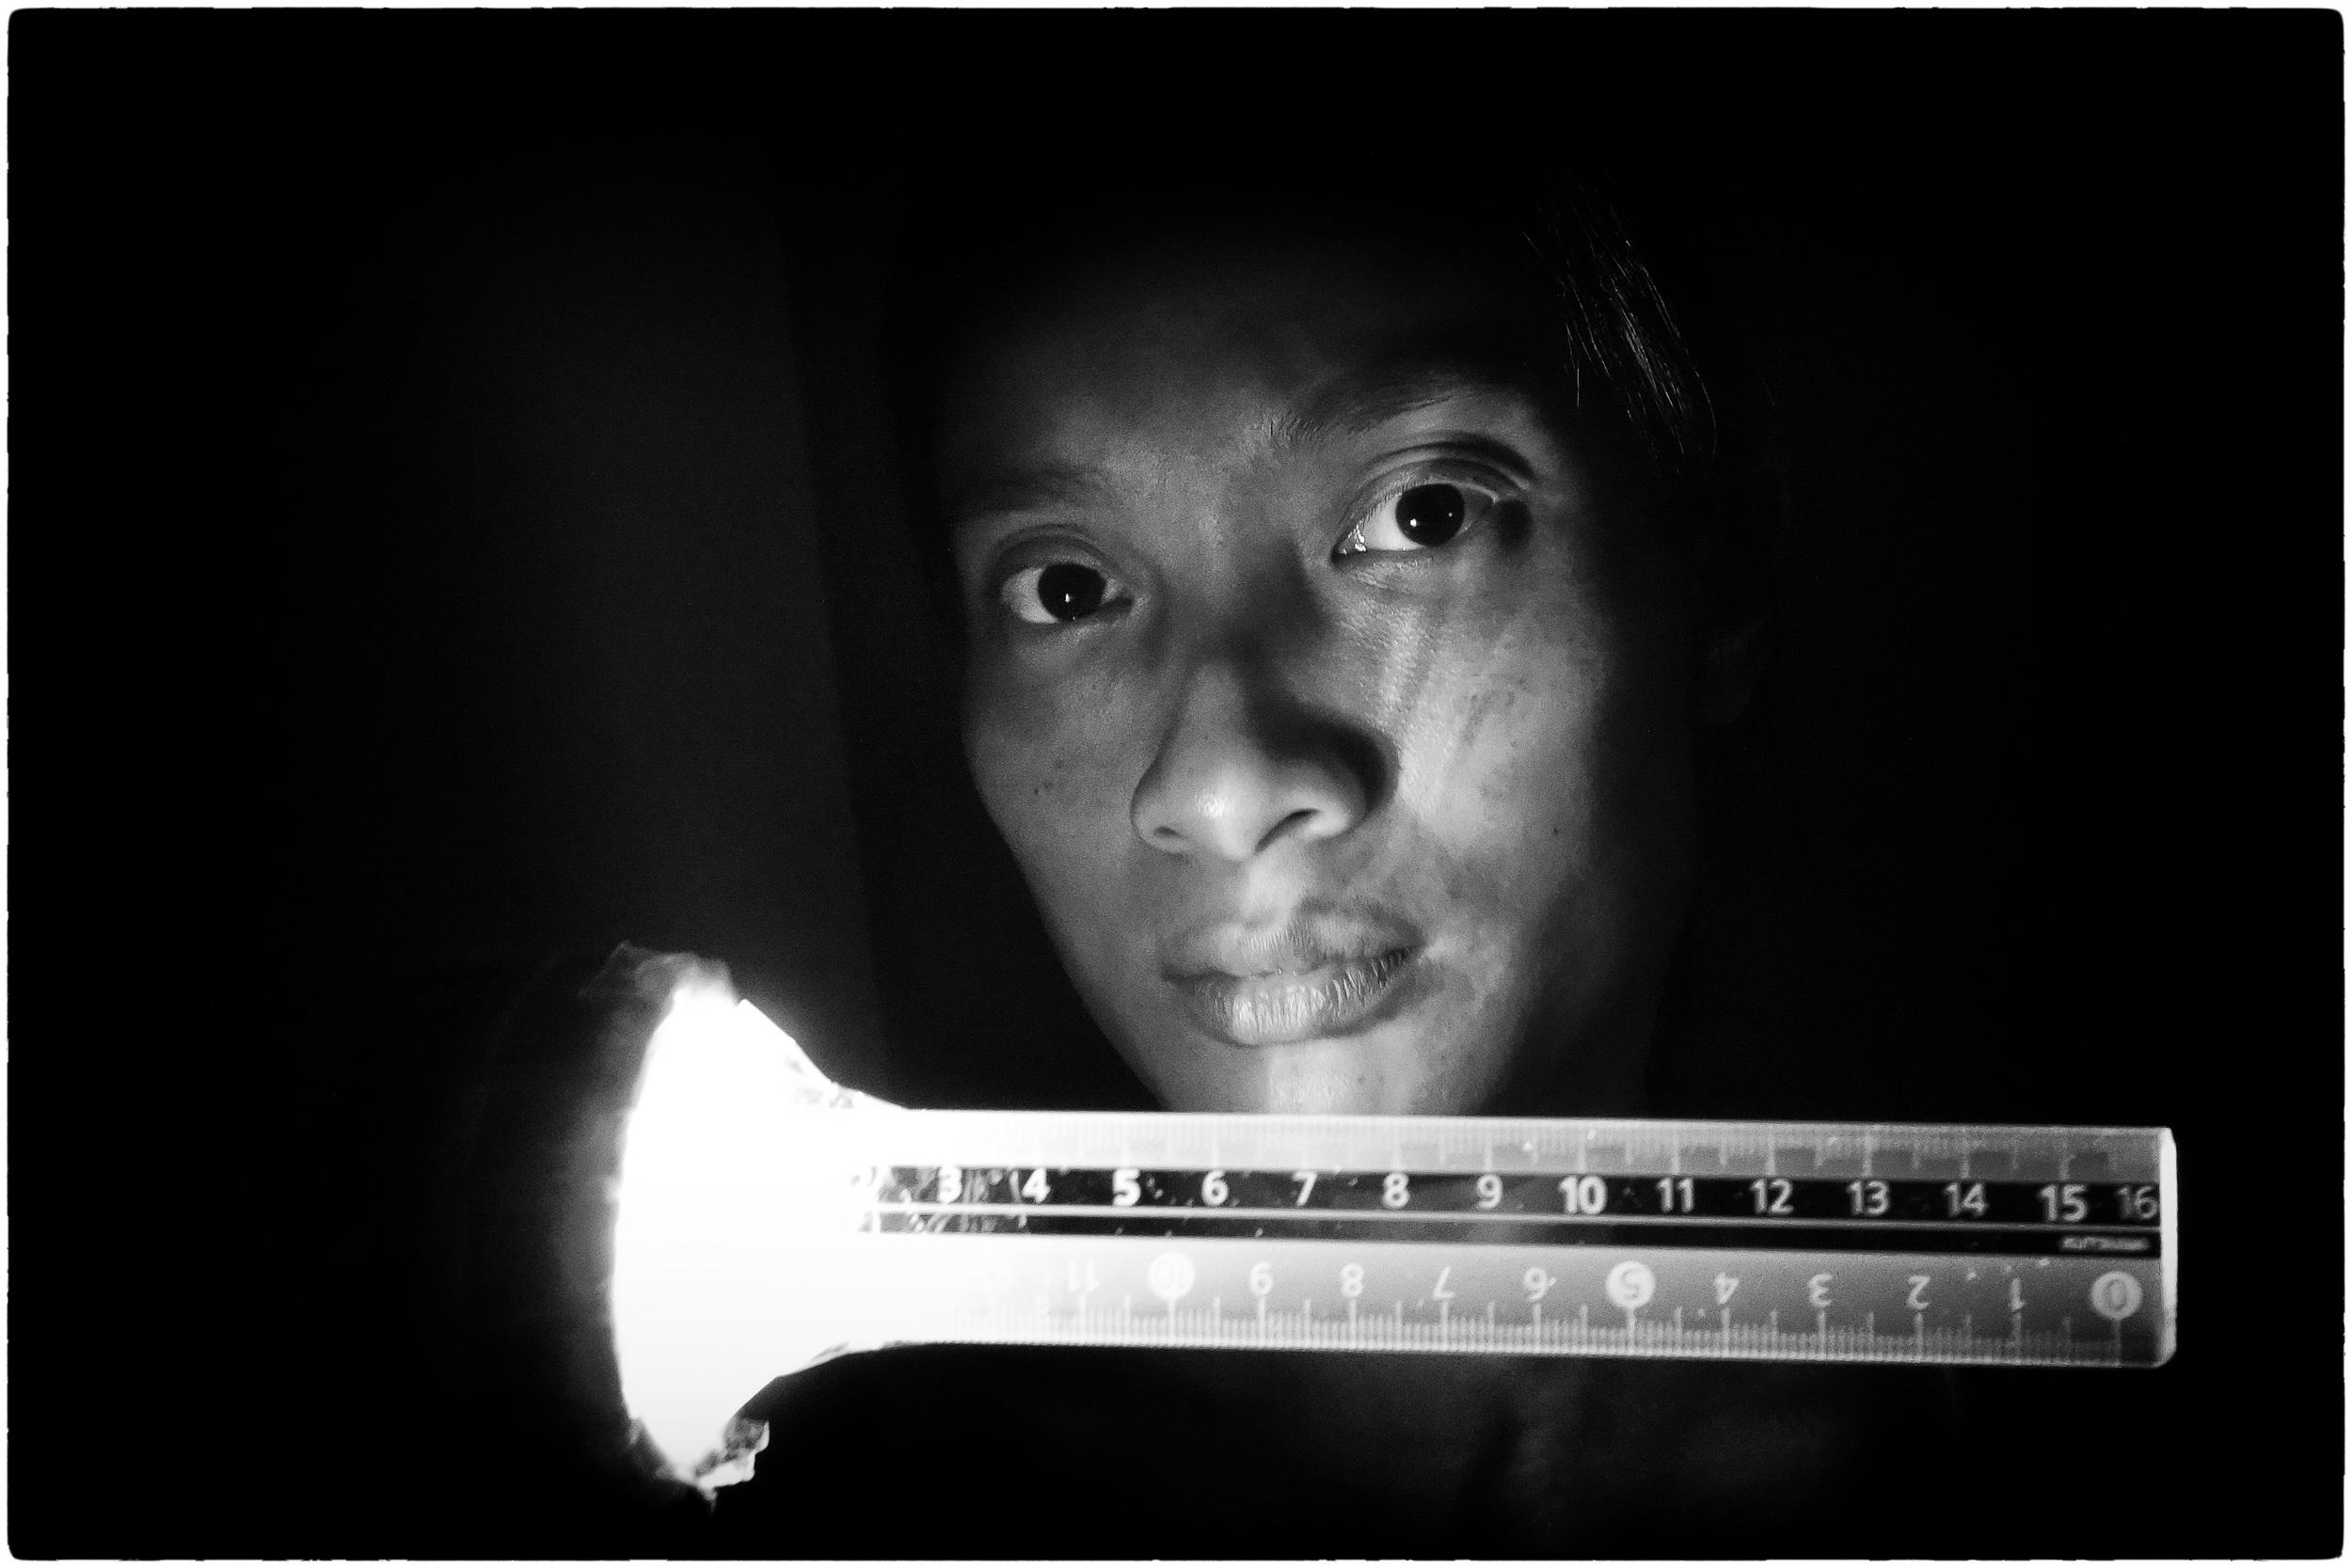 The Light Meter for Wei Leng.